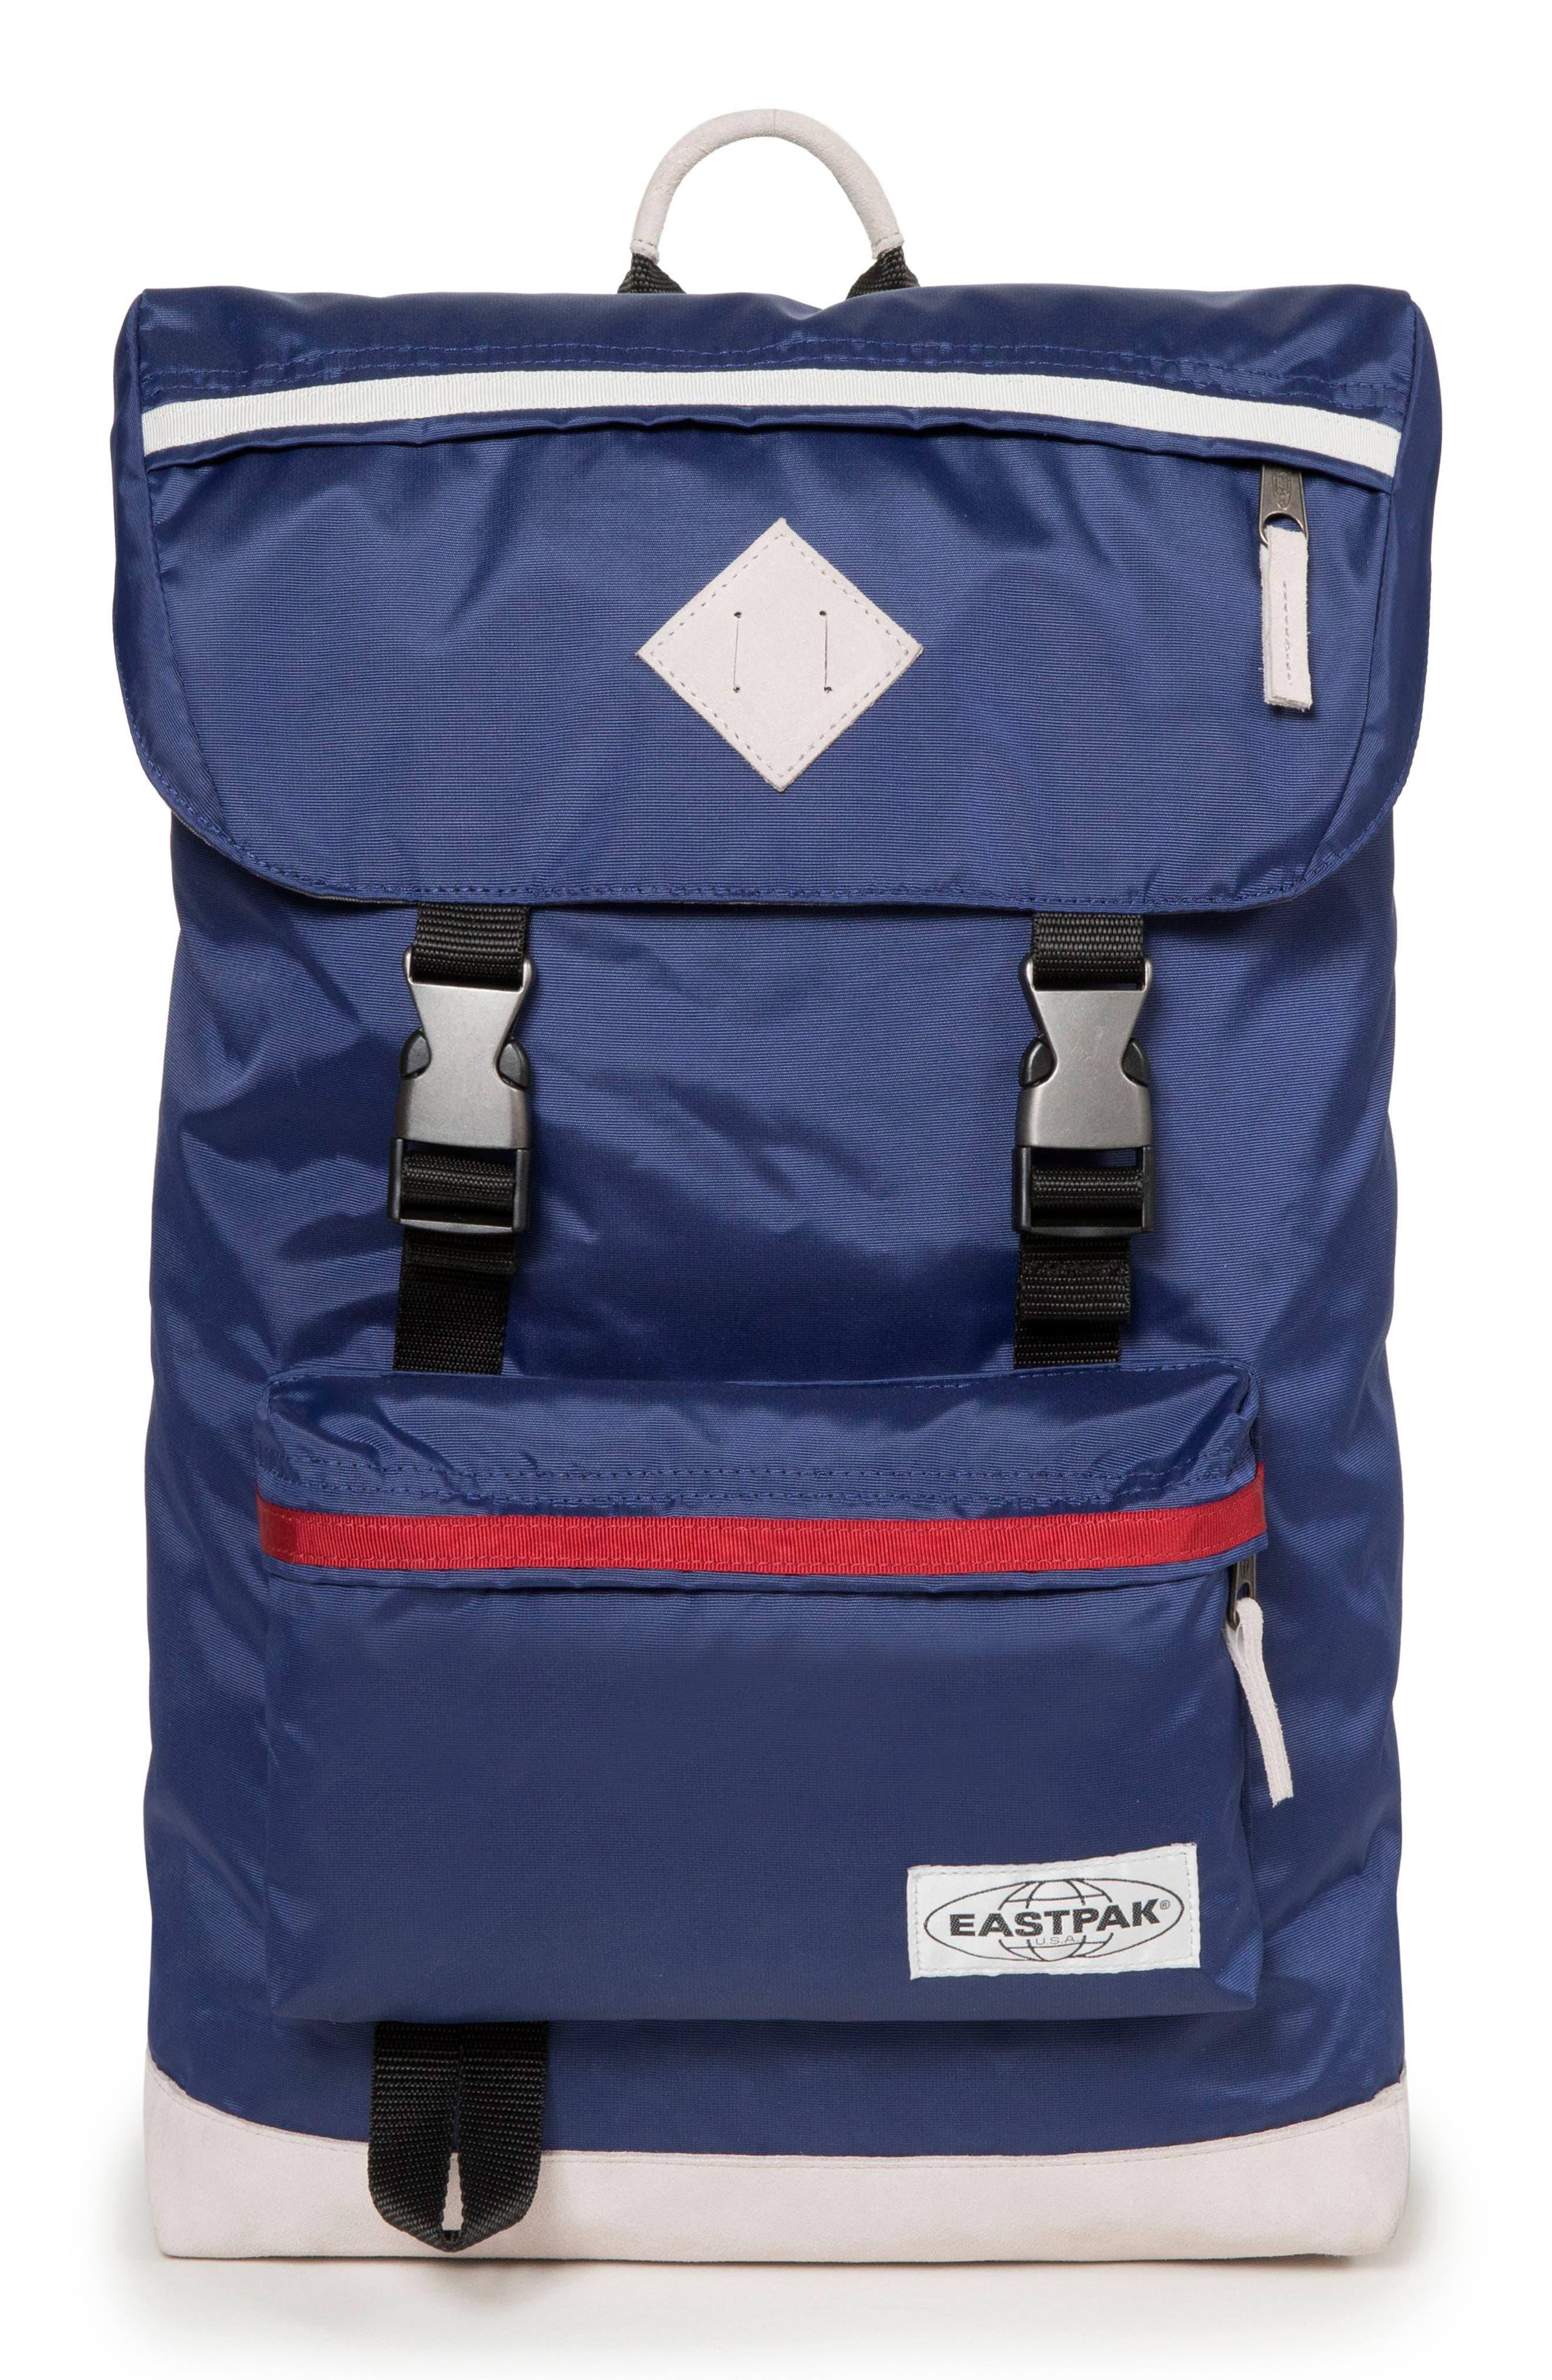 Eastpack Rowlo Backpack - Blue